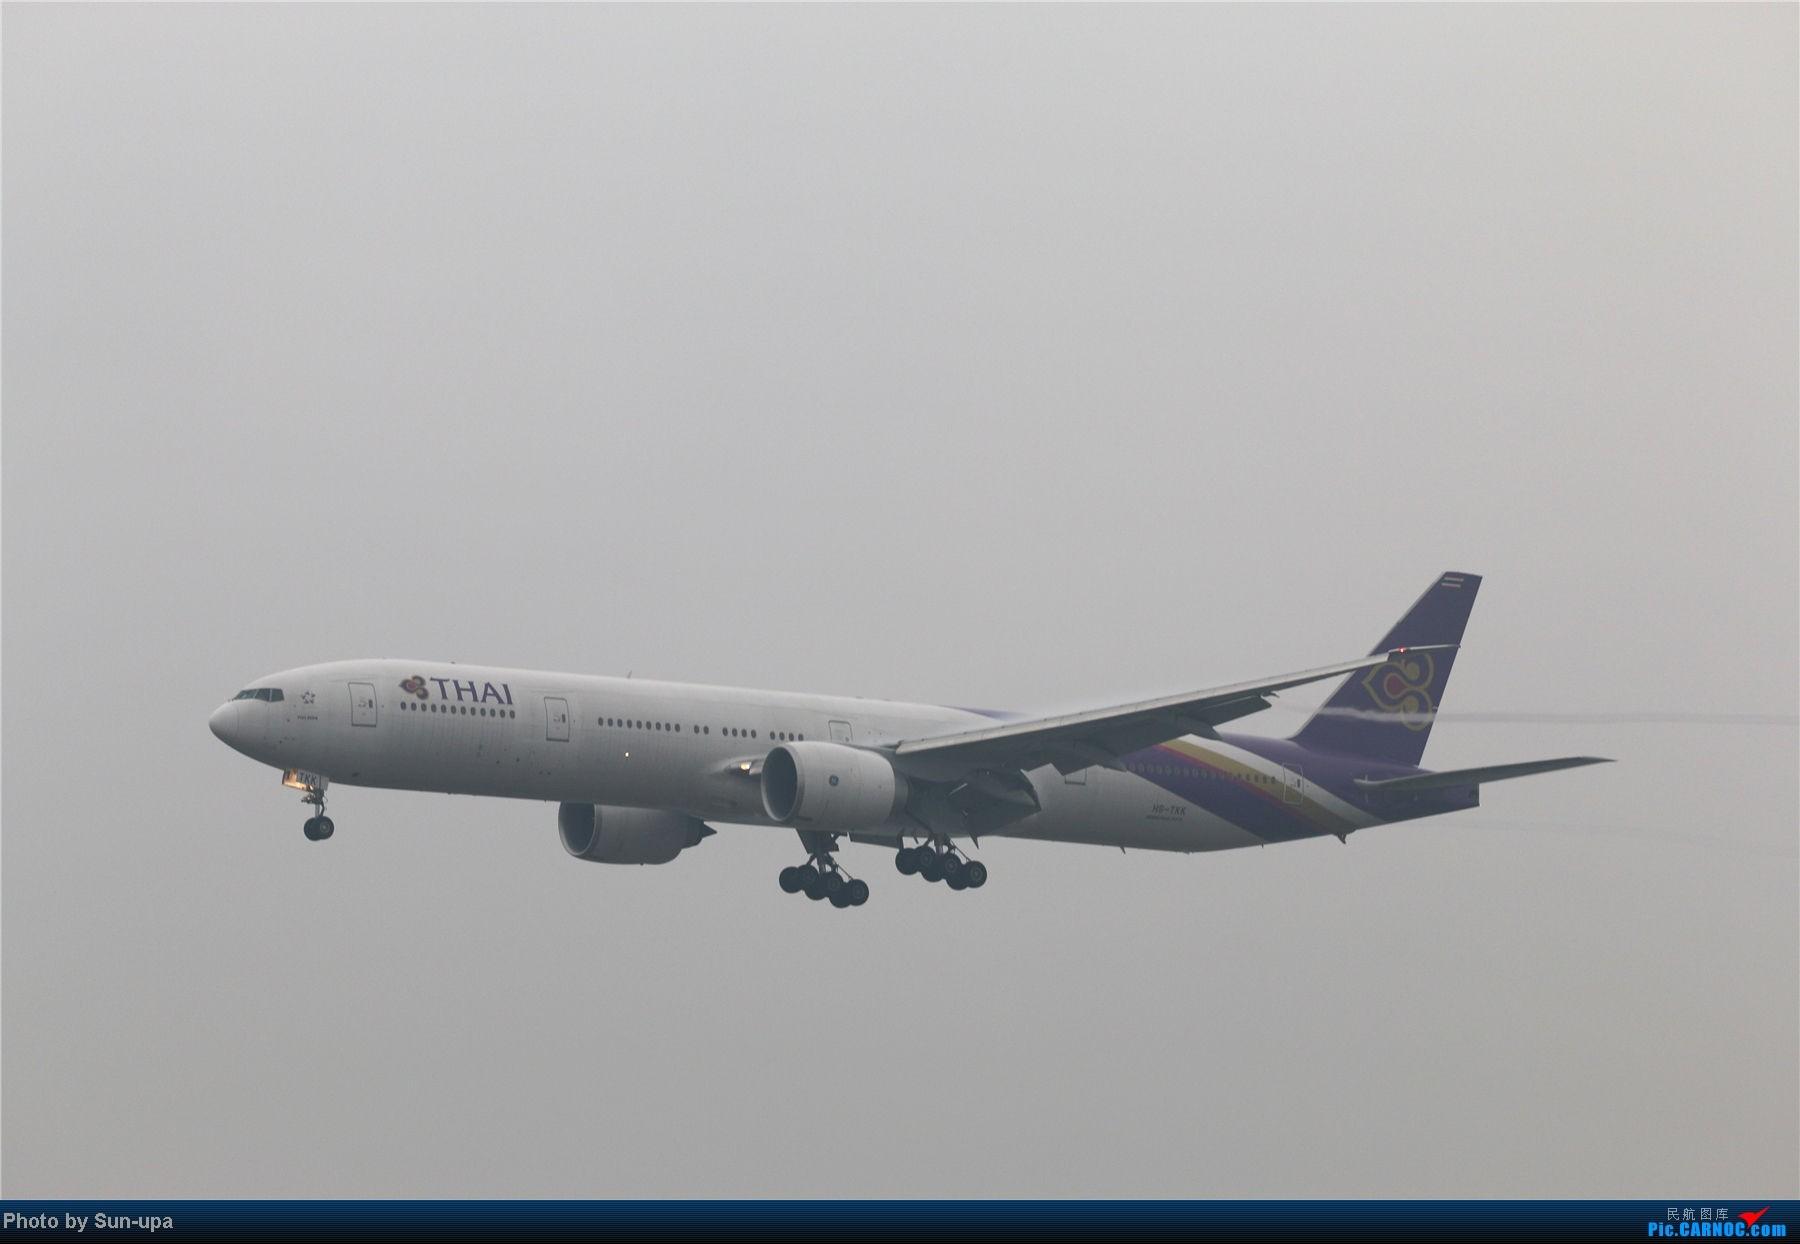 Re:[原创]冷雨天冒着雨拍了一下午 终于等到国航747-8 还有很多好货 BOEING 777-300ER HS-TKK 中国北京首都机场